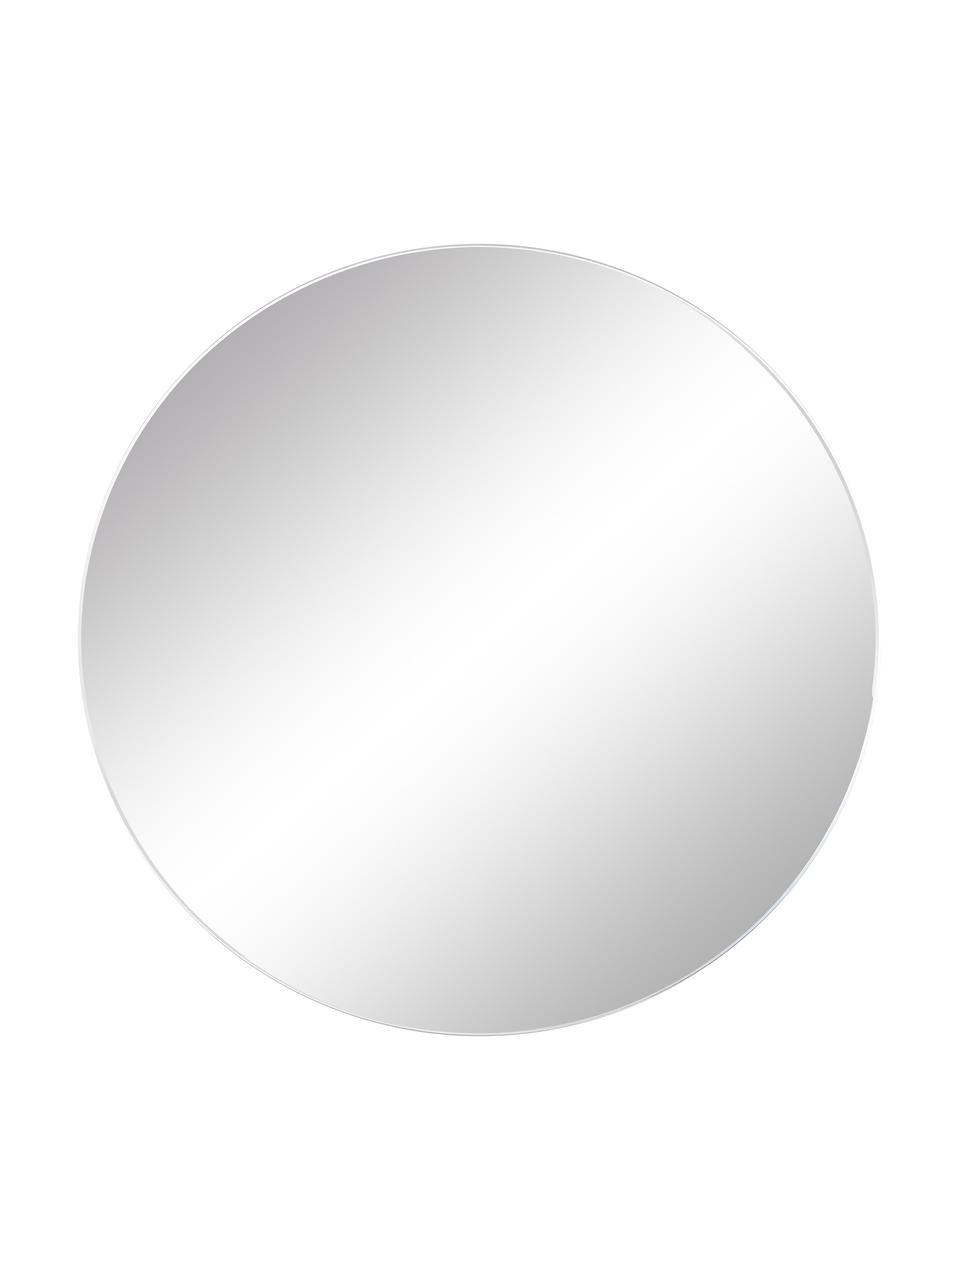 Ronde wandspiegel Erin zonder lijst, Spiegelvlak: spiegelglas. Buitenrand: zwart, Ø 55 cm